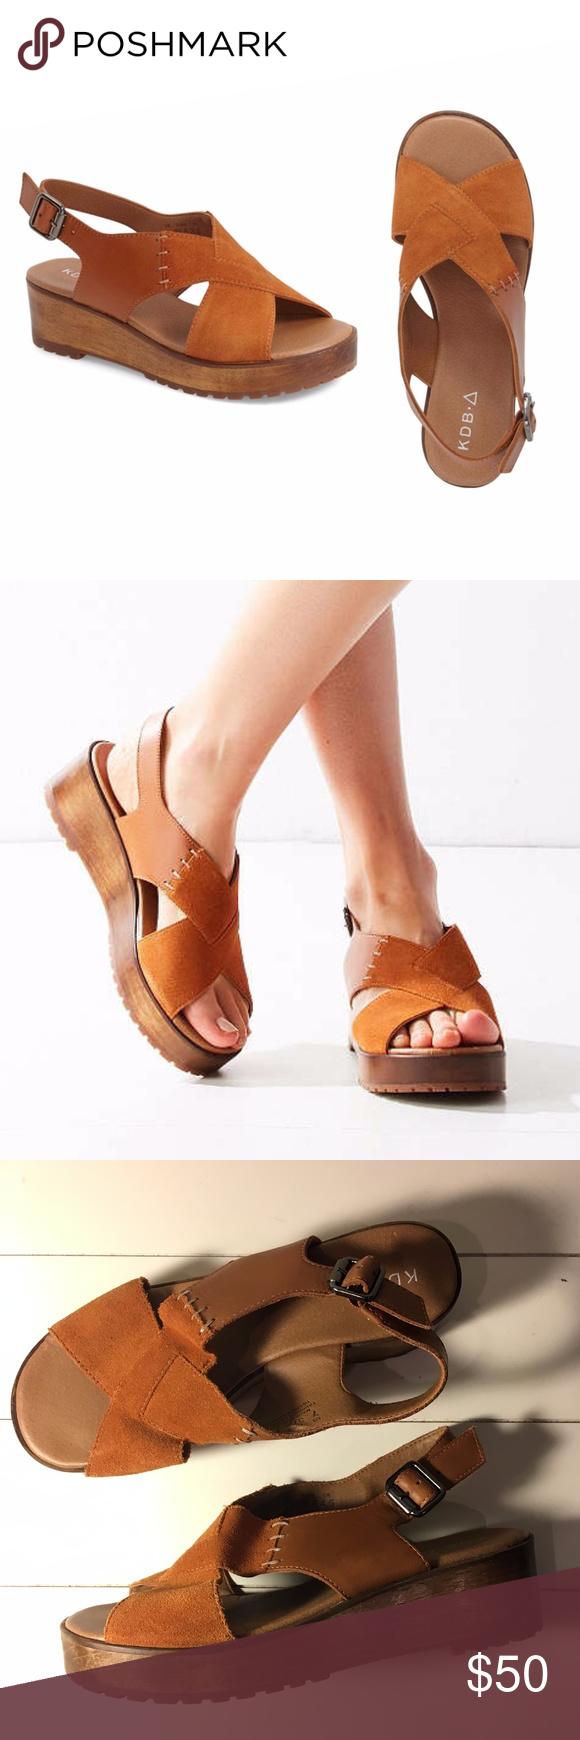 f18307f7aef9 Kelsi Dagger Brooklyn Wood Platform Sandals NWOT  Brand New Platform Wood  Sandals from UrbanOutfitters